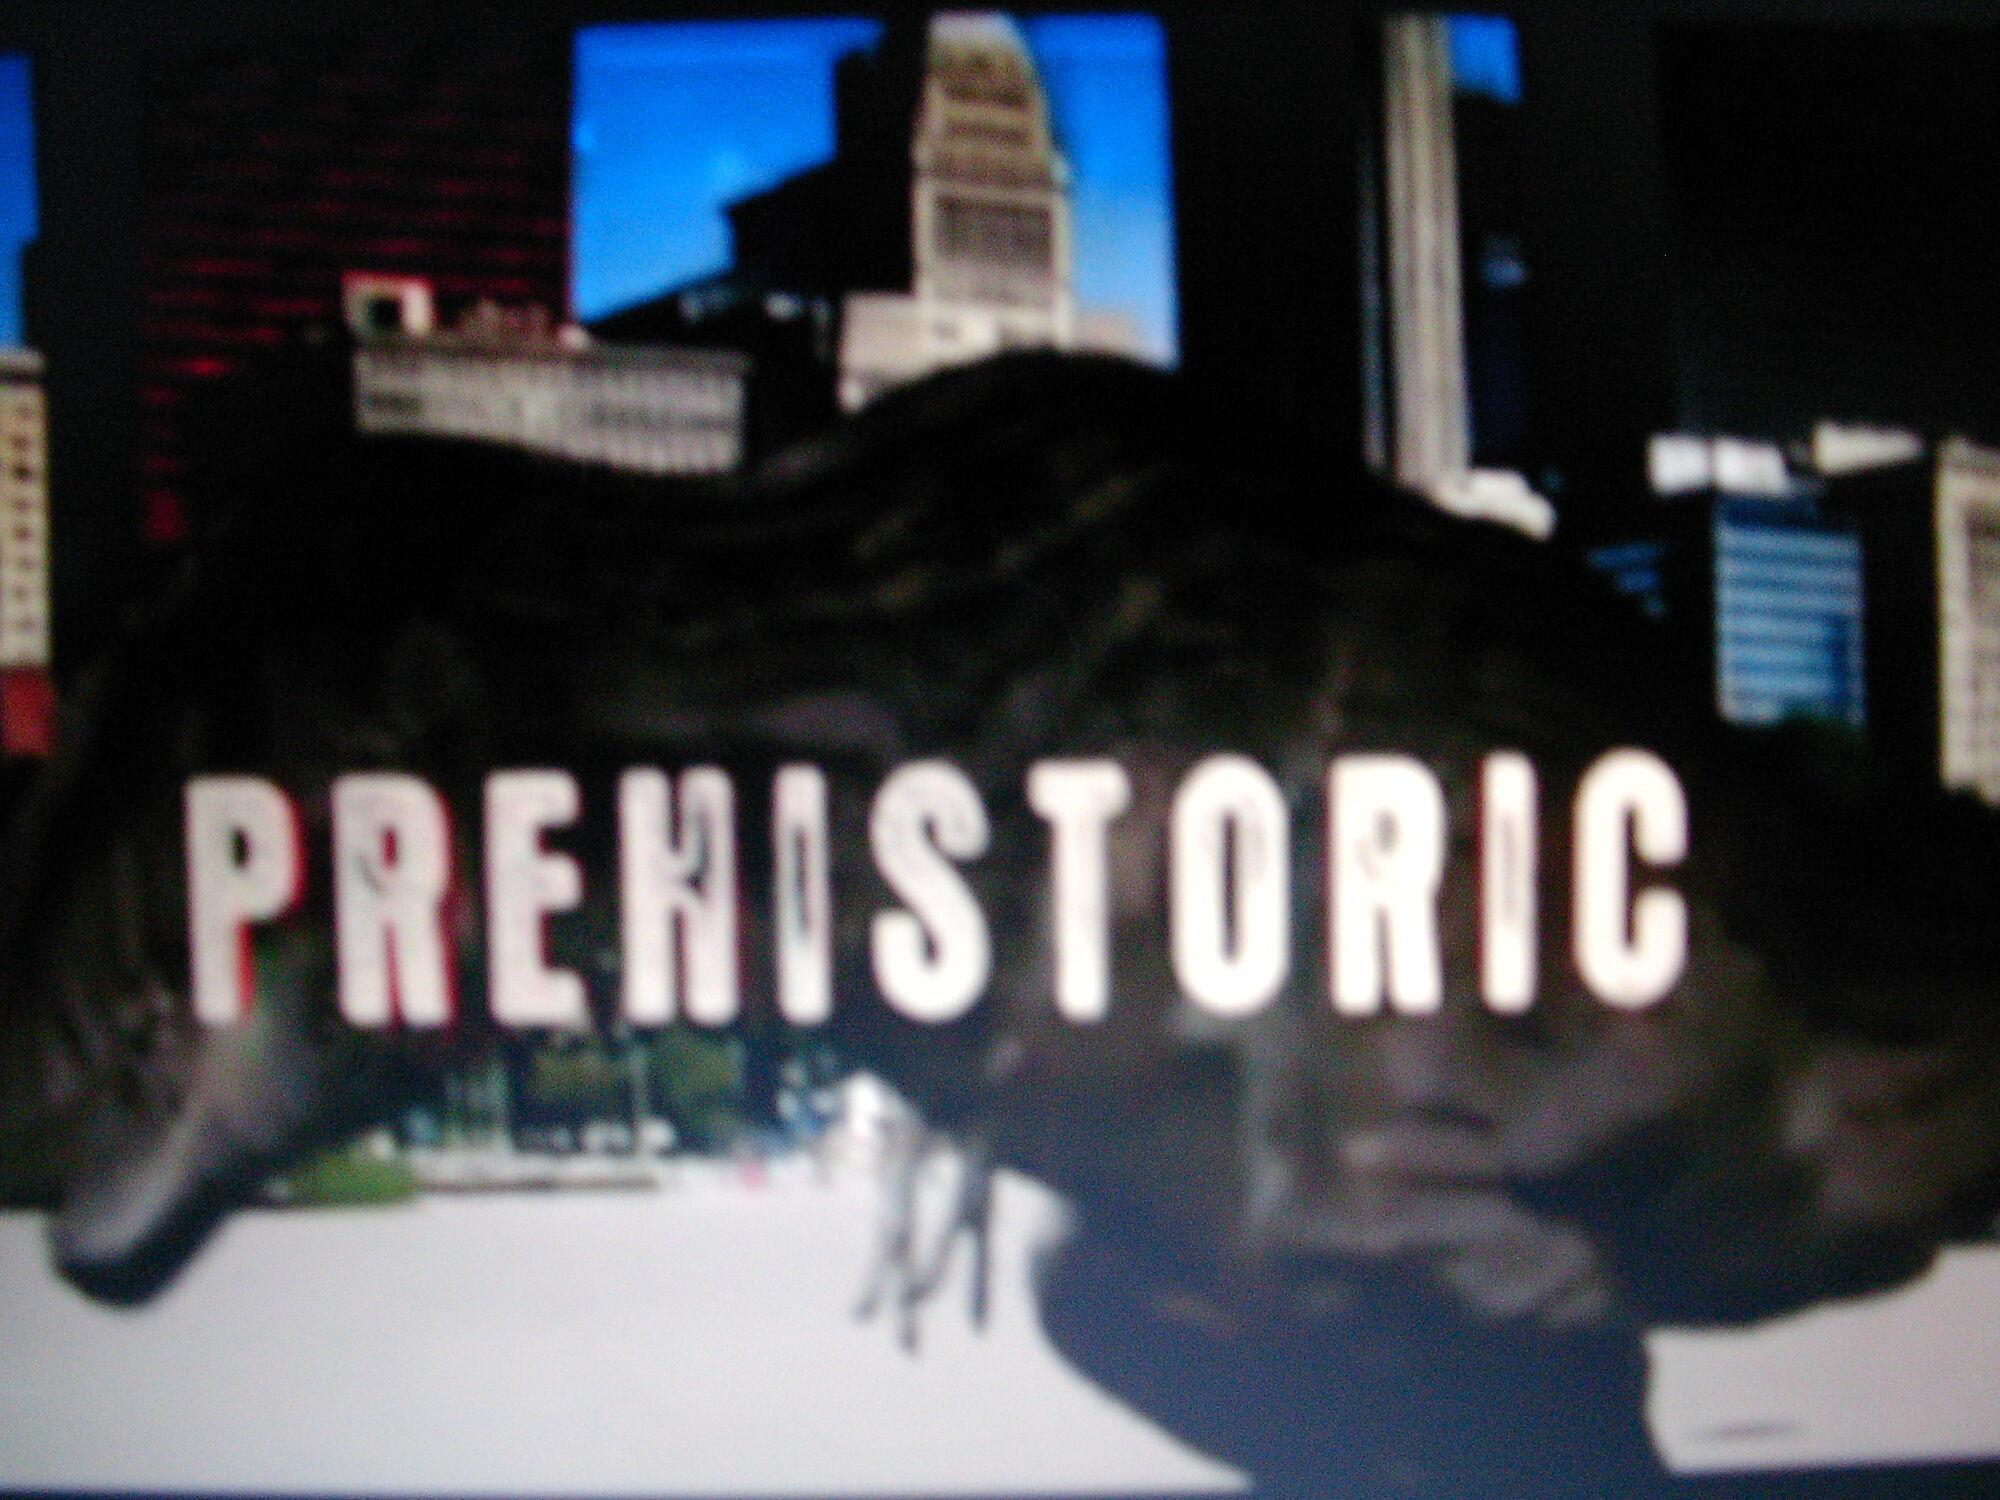 Prehistoric Chicago | Prehistoric Wiki | FANDOM powered by ...  Prehistoric